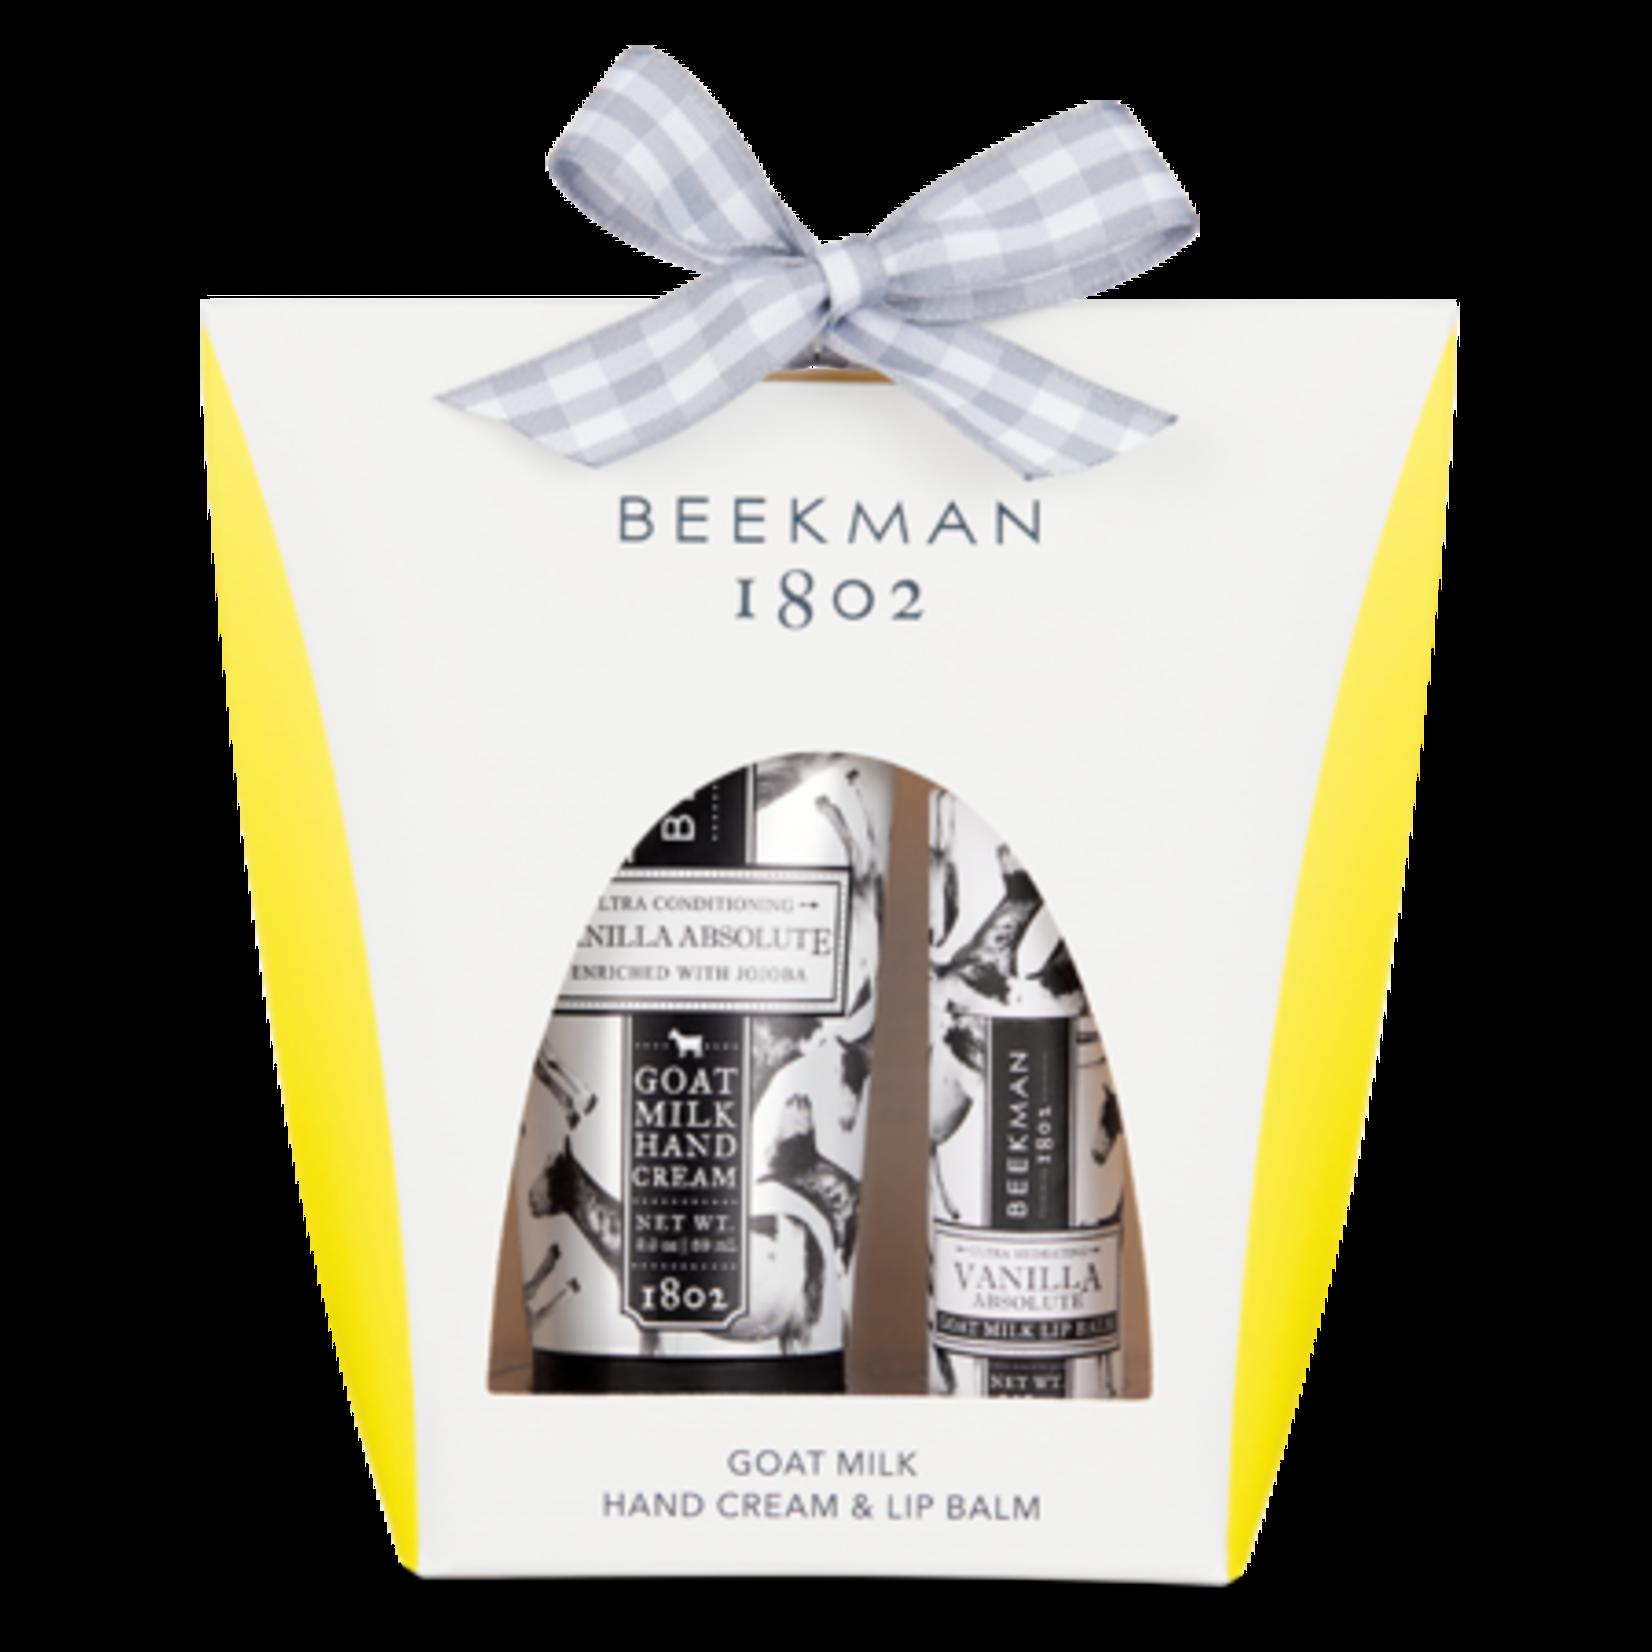 BEEKMAN 1802 Vanilla Absolute Hand & Lip Hydration Kit